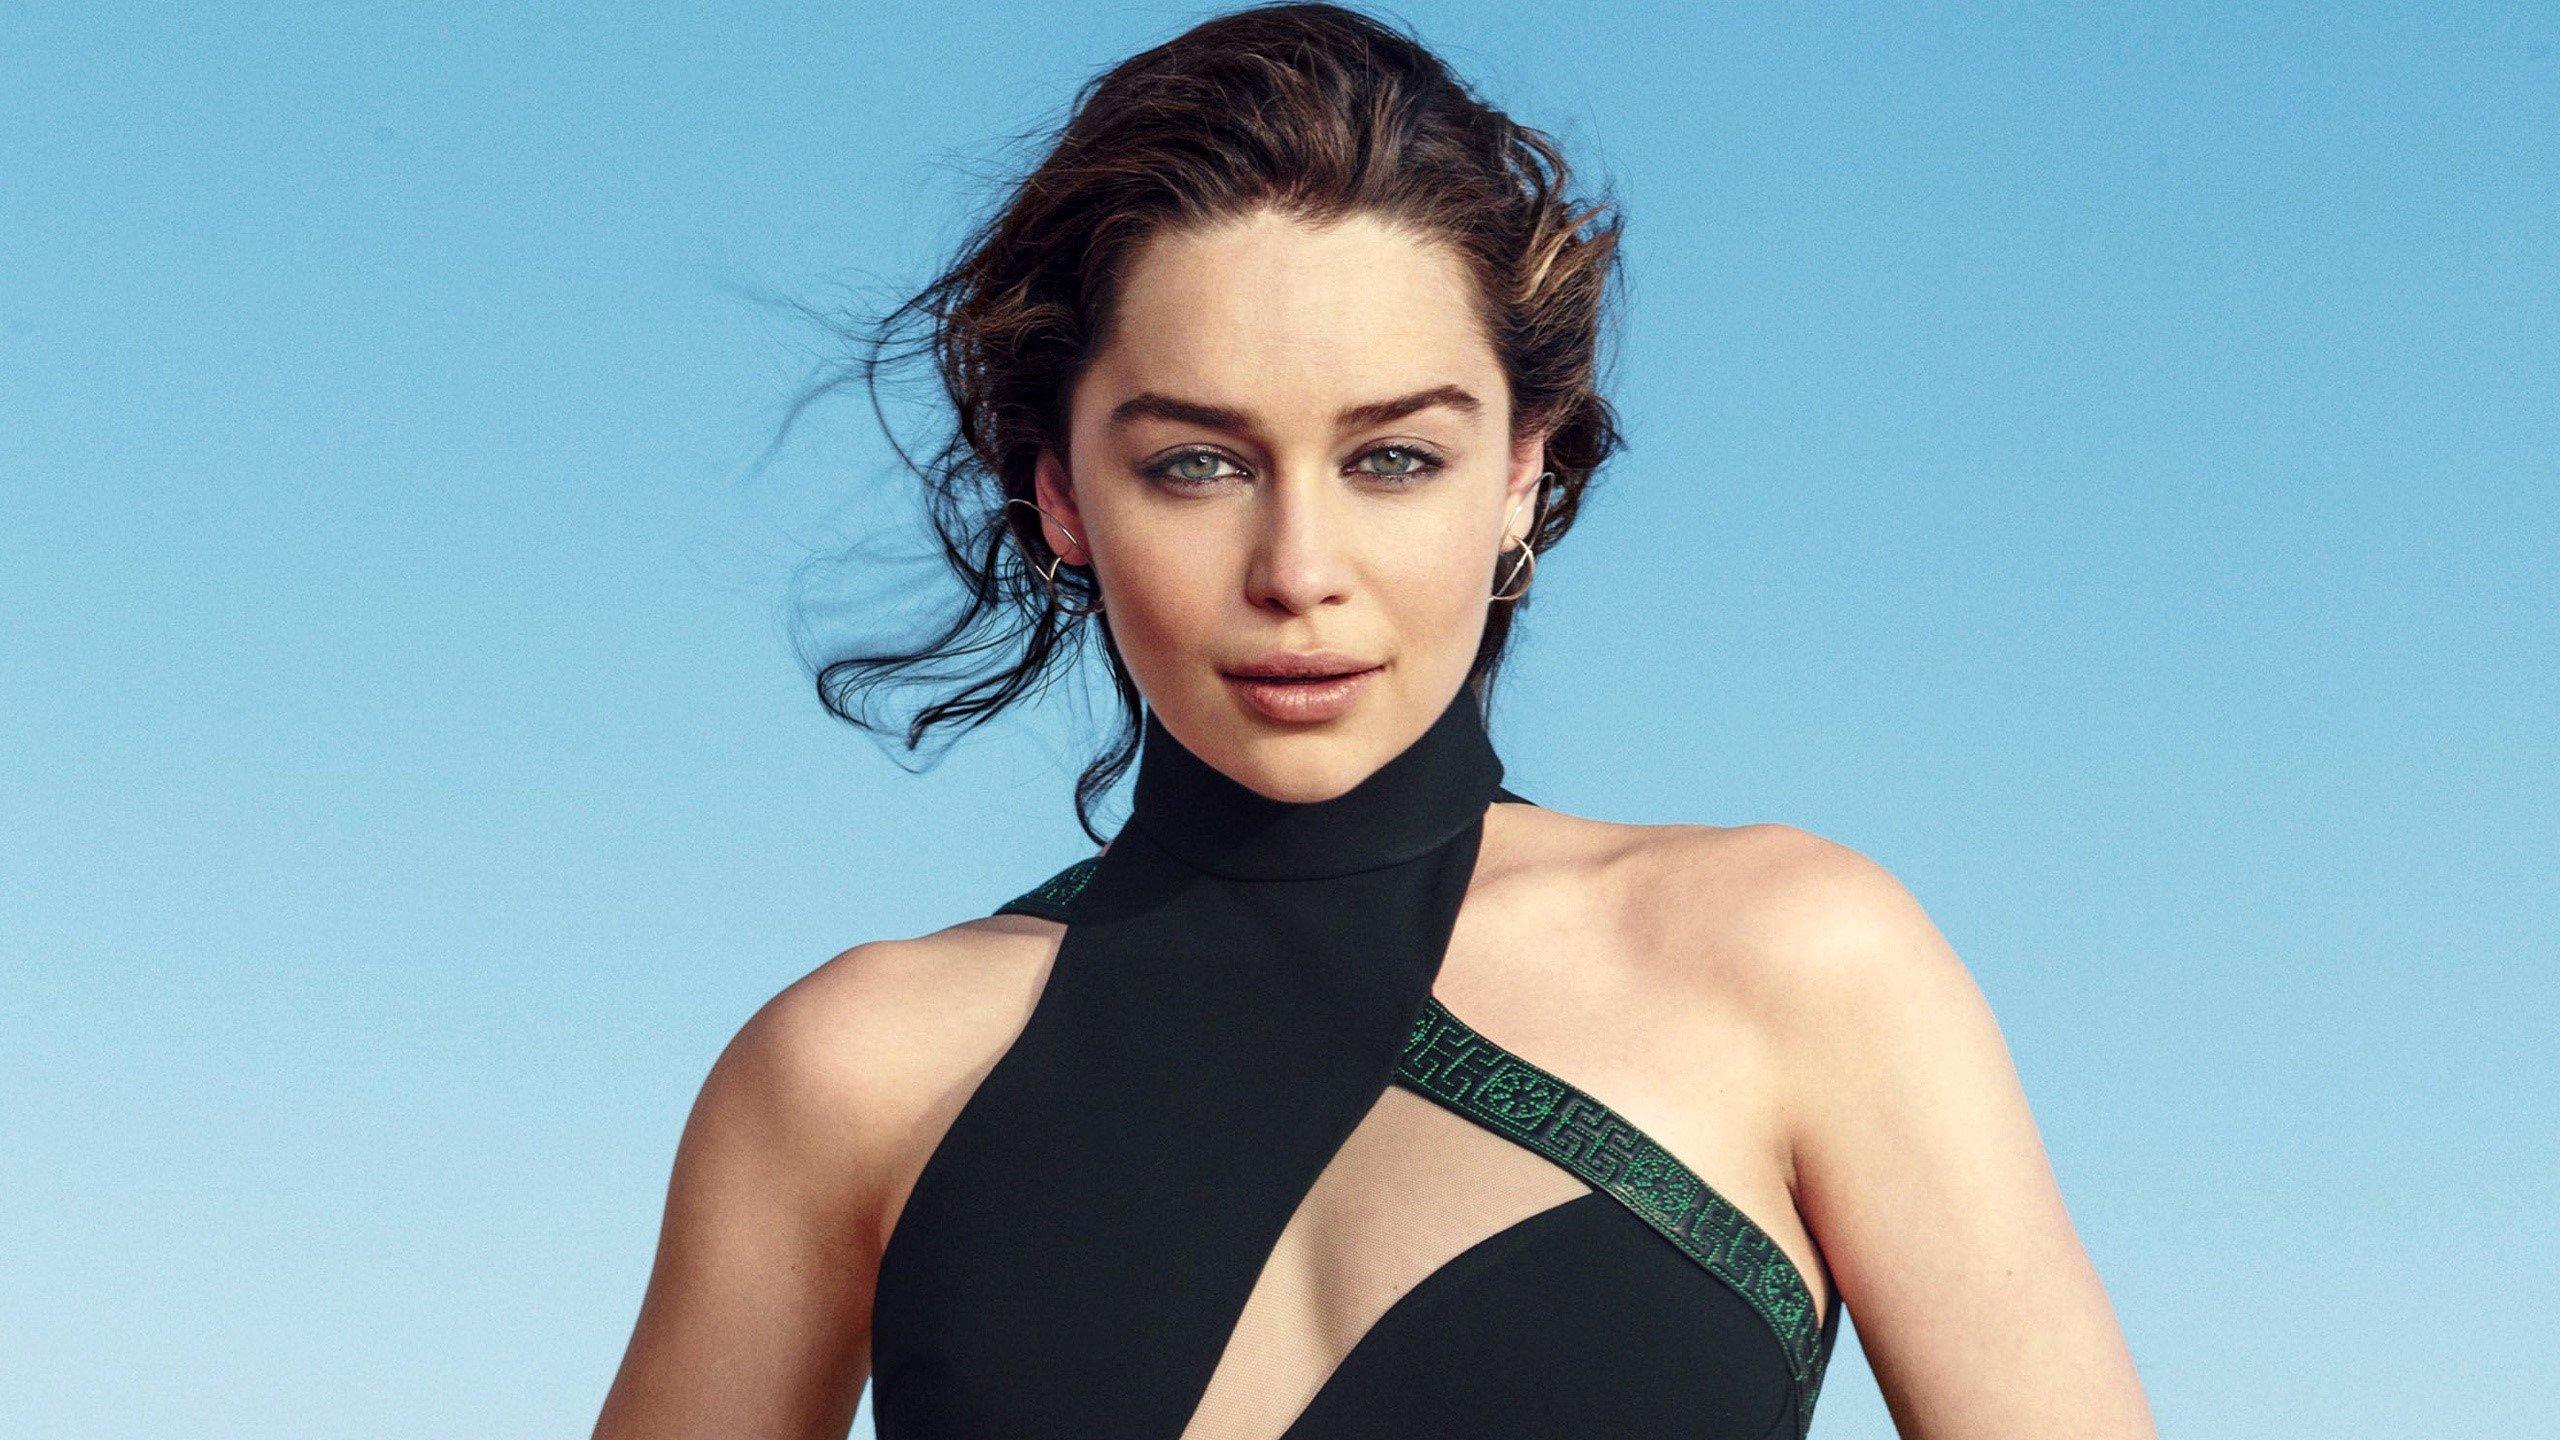 Wallpaper Emilia Clarke brunette